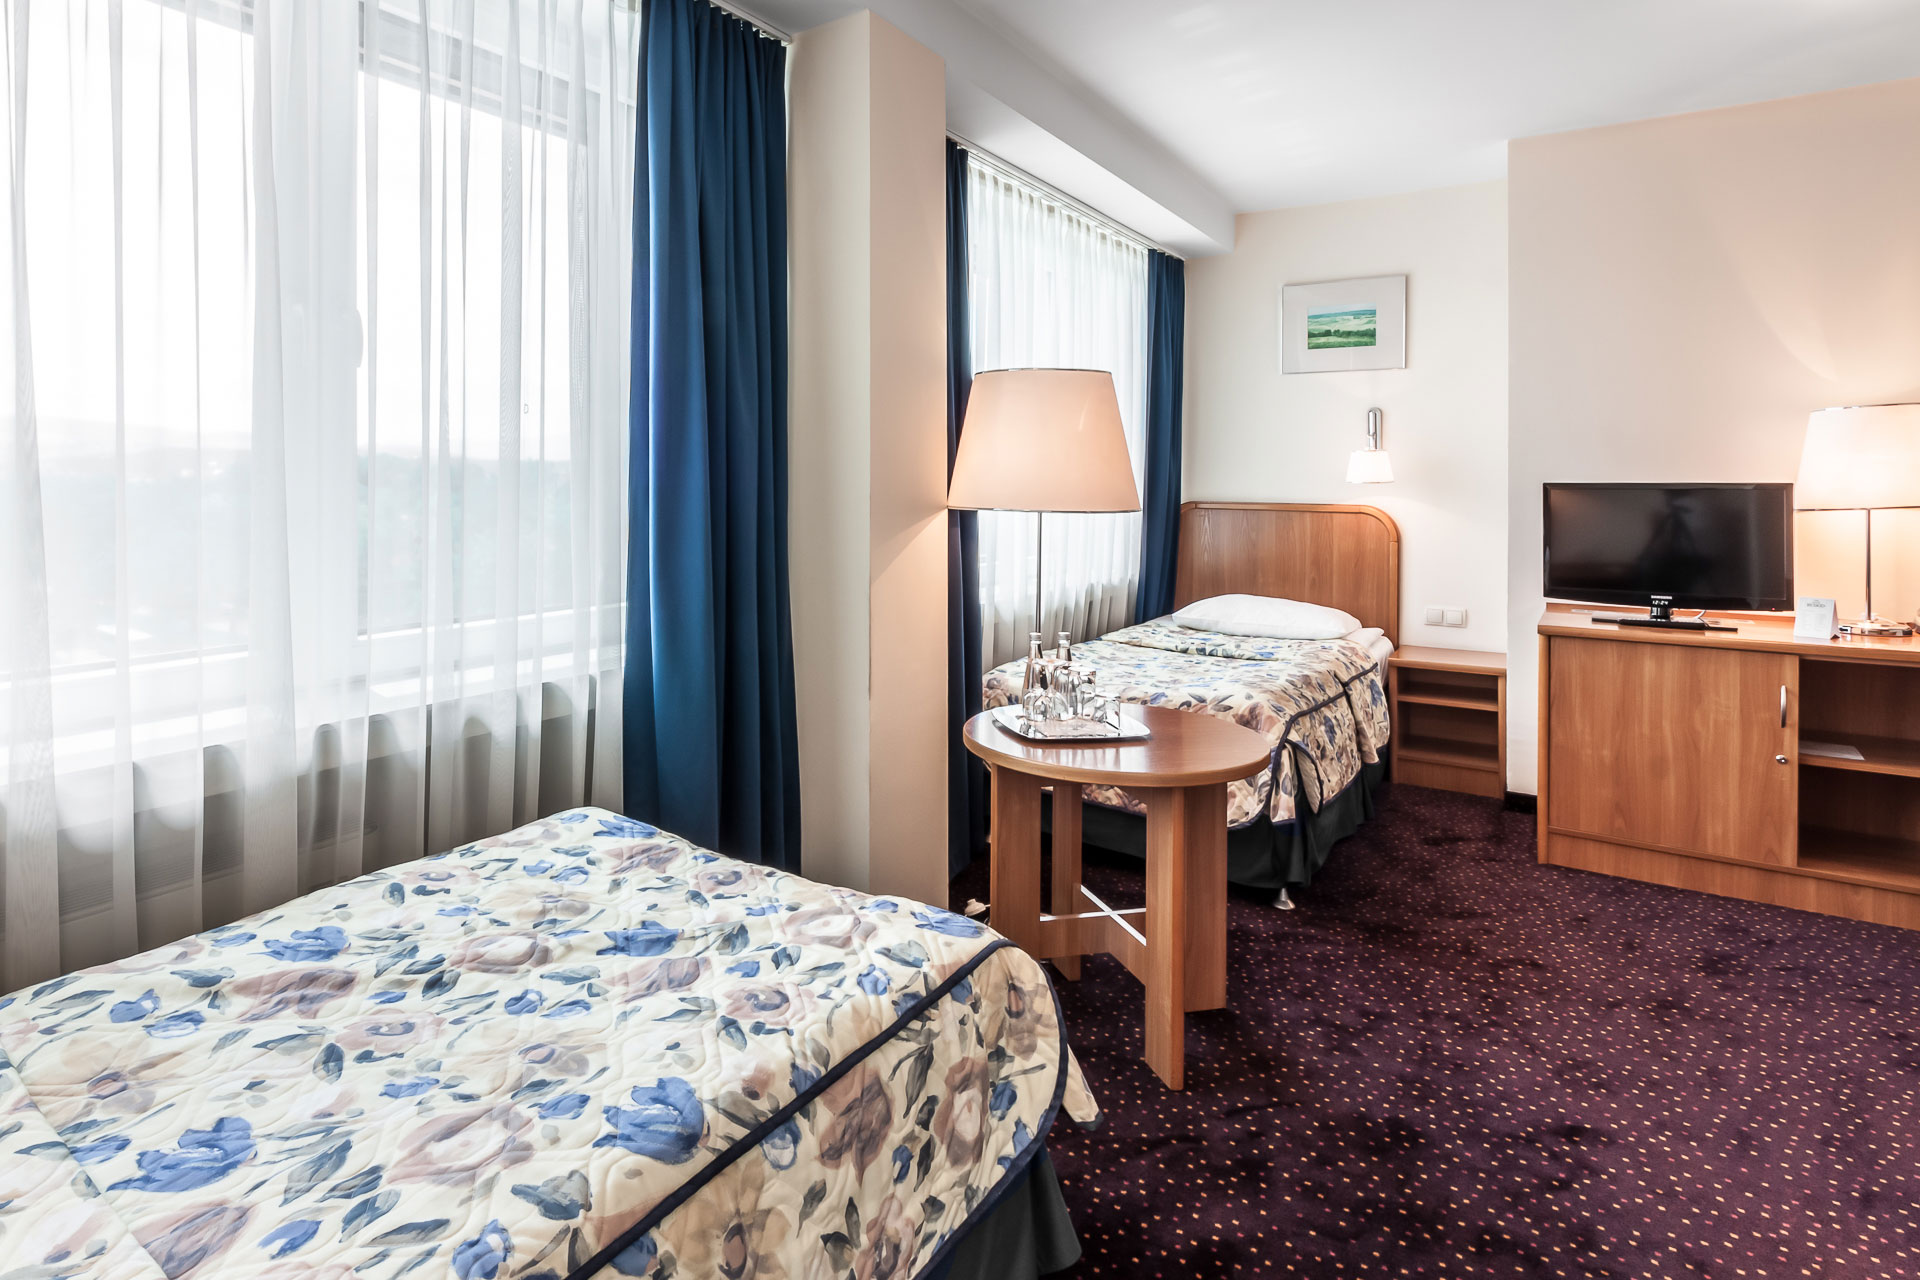 Zdjęcie - Standard double room - Hotel Beskid****